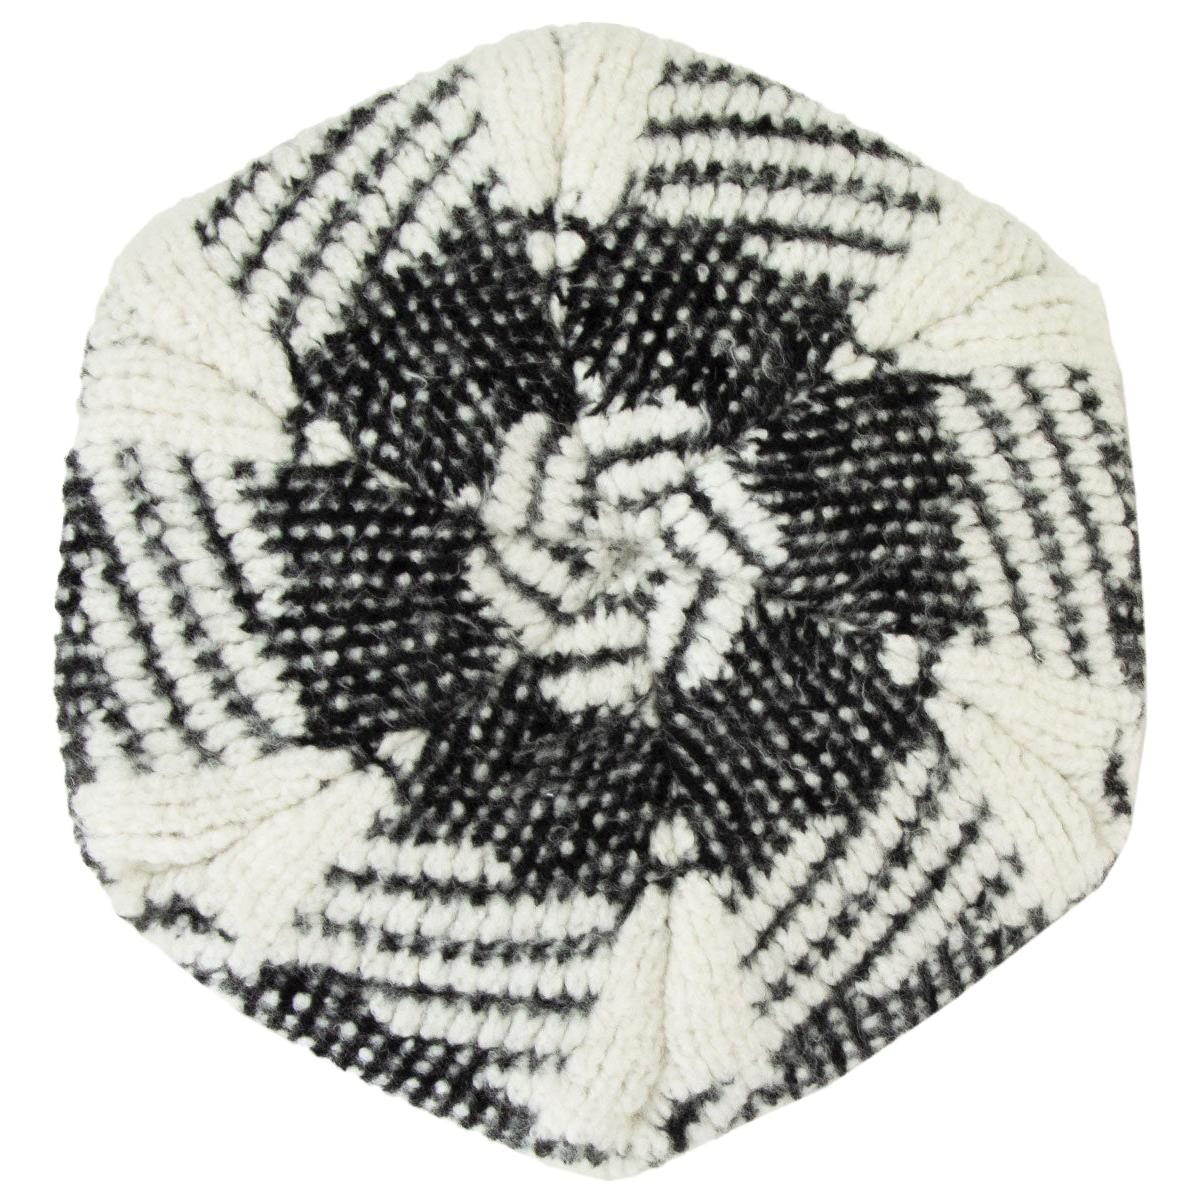 CHANEL black & white cashmere blend KNIT BERET Hat M